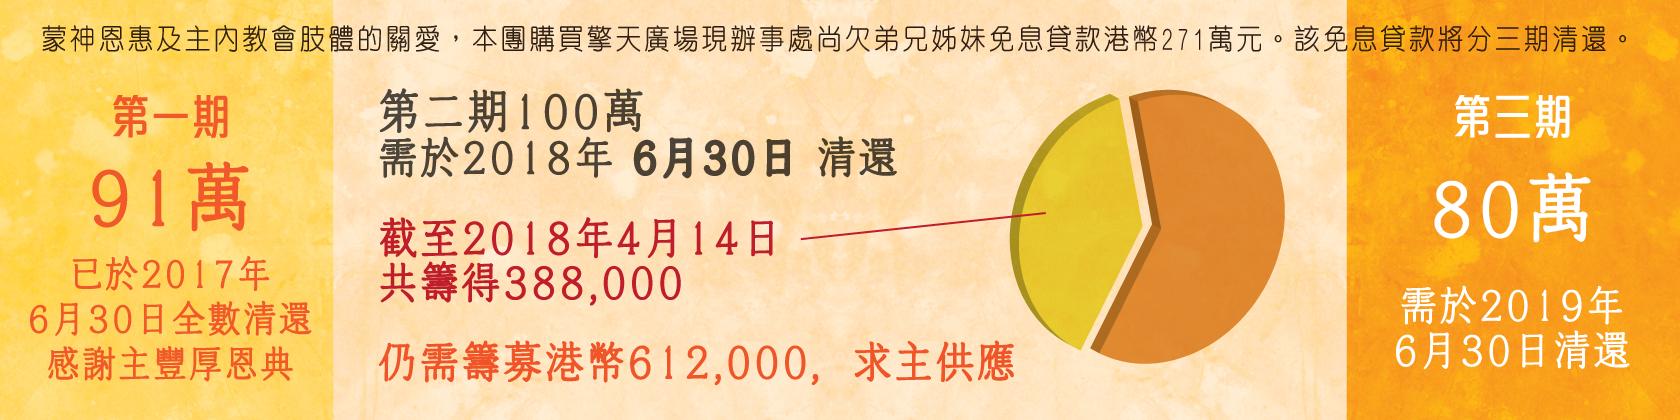 CB-02-web-banner-1680-x-420-06-3